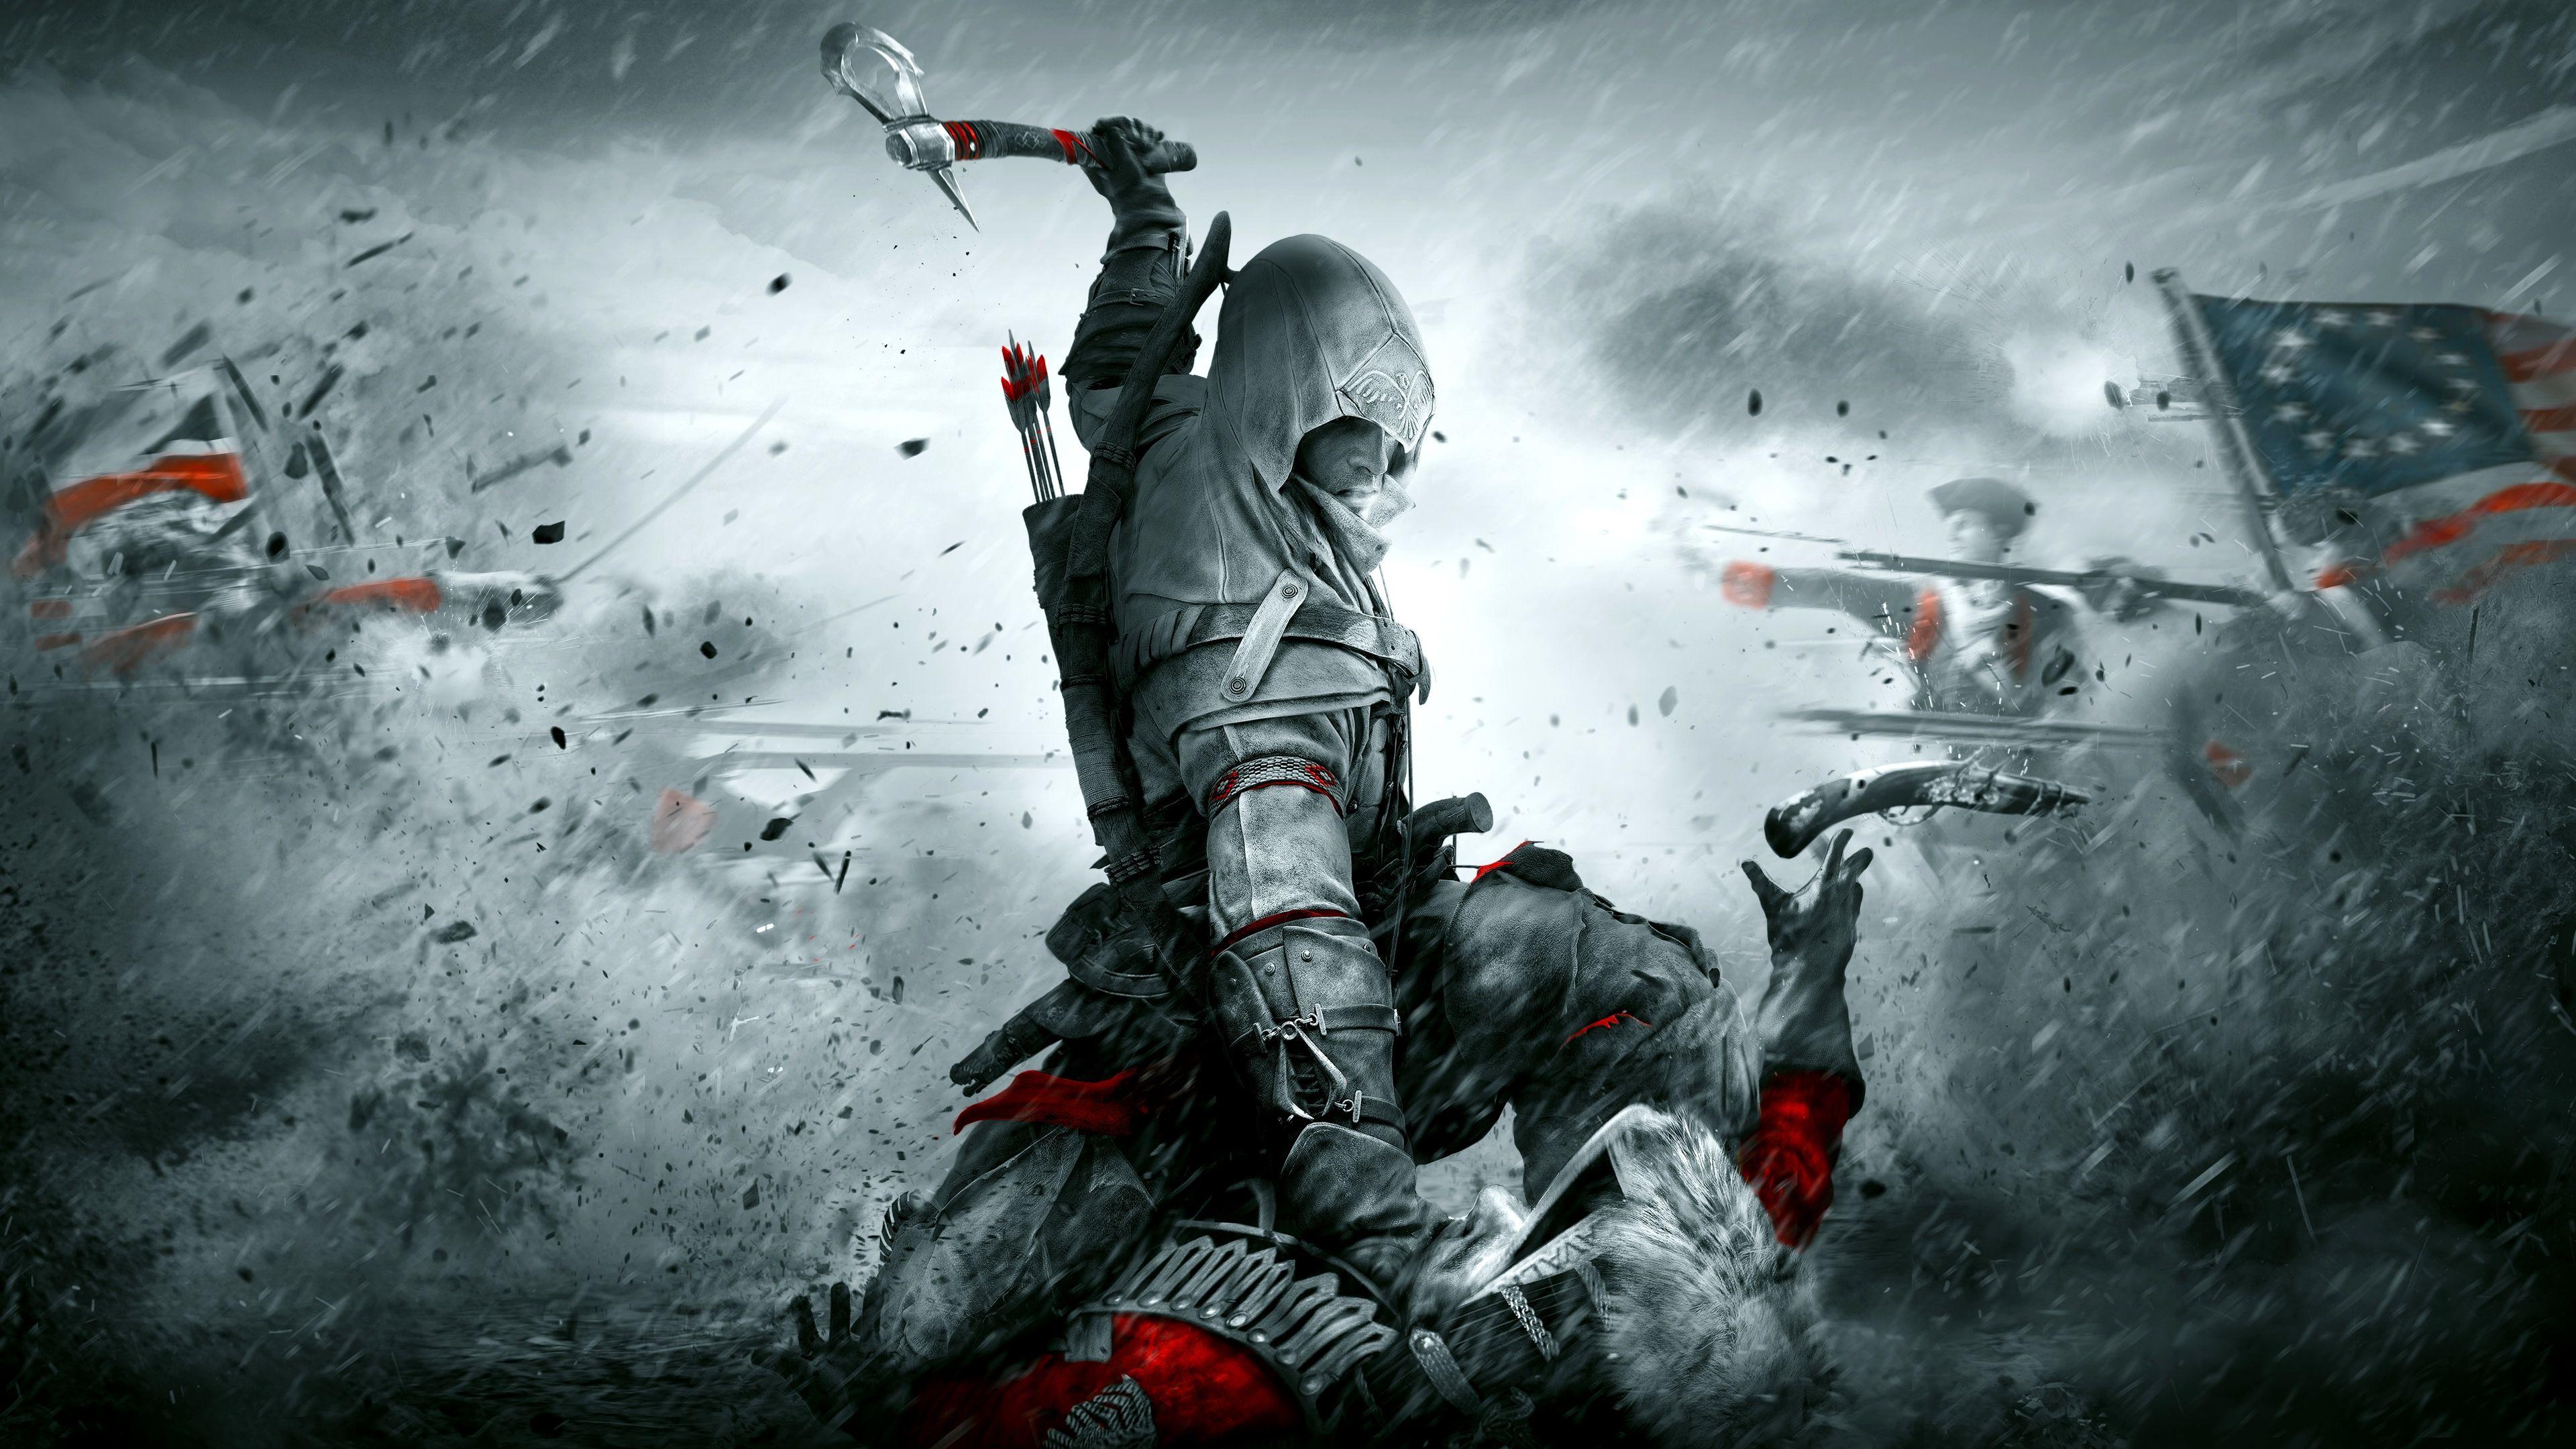 Assassin S Creed Wallpaper 4k Pc Gallery Assassin S Creed Wallpaper Creed Wallpaper Assassins Creed